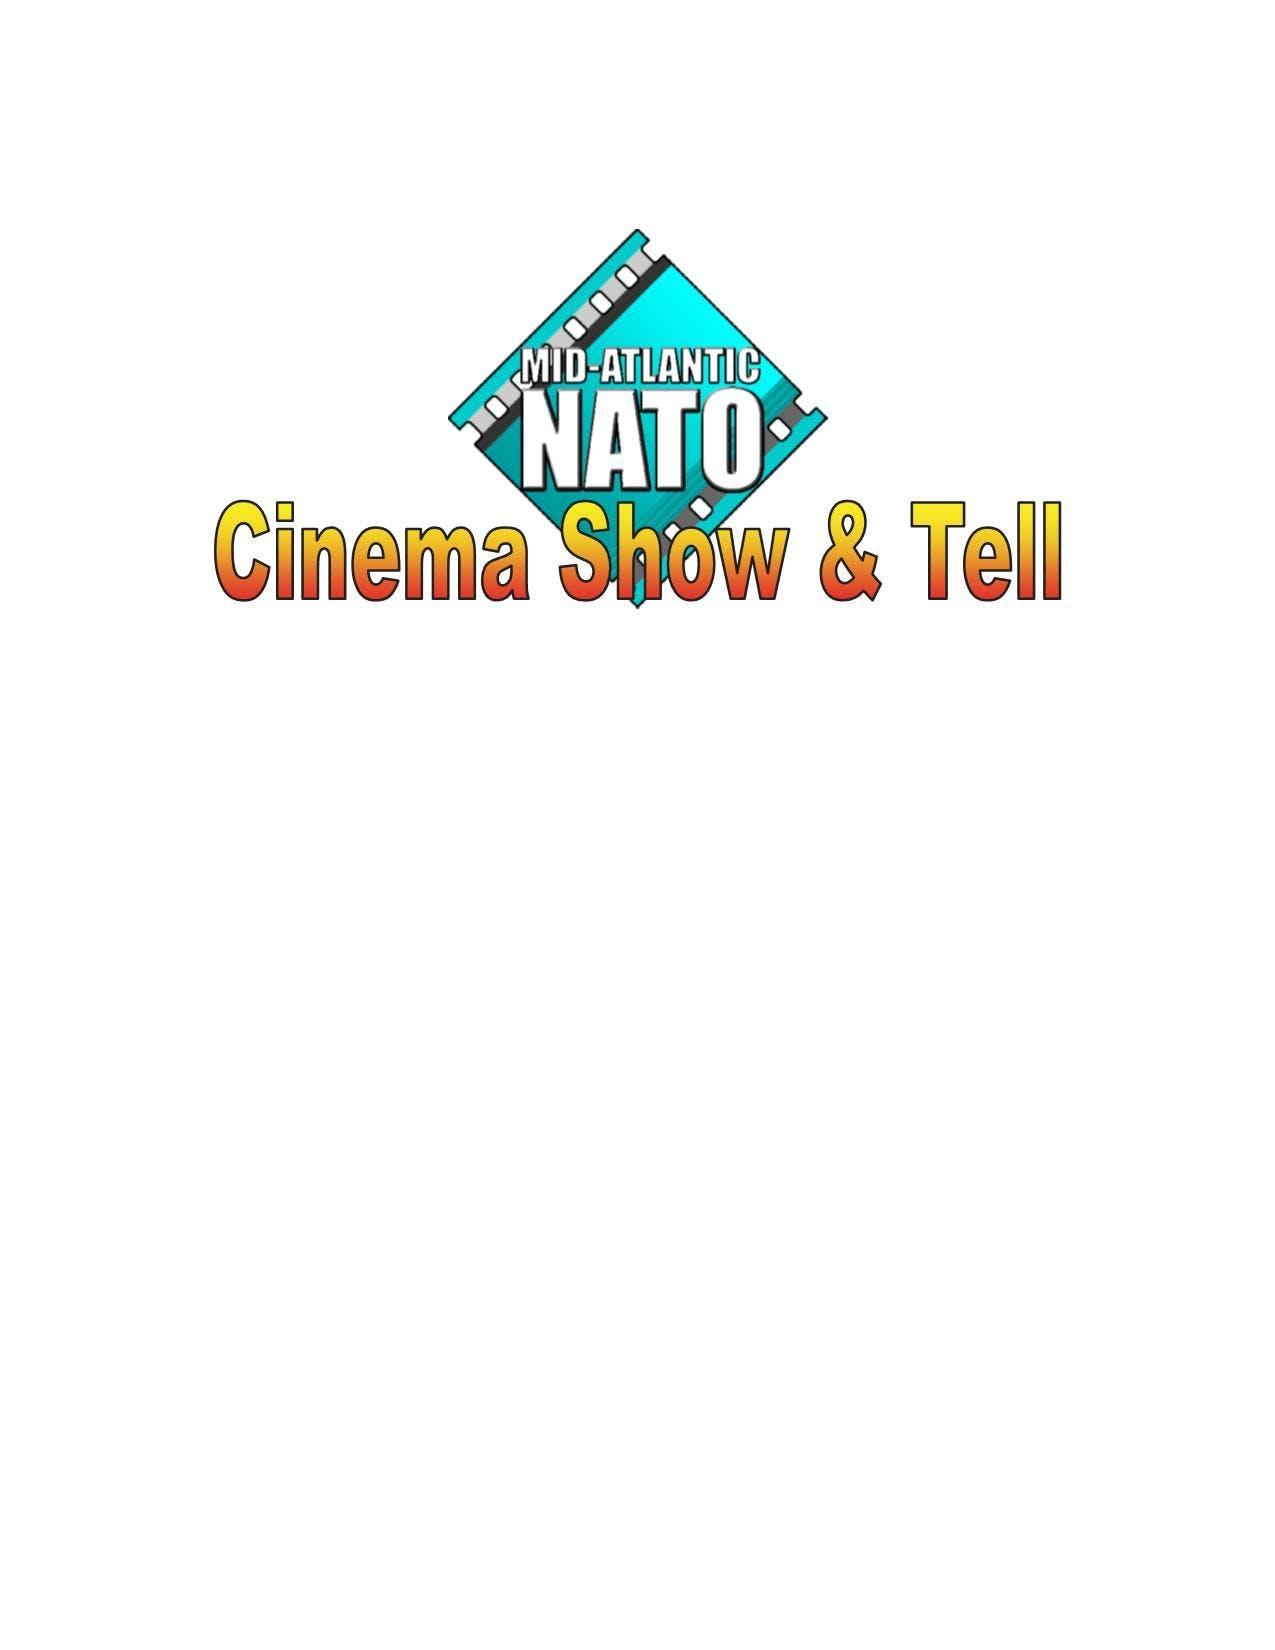 Mid-Atlantic NATO &quotCinema Show &amp Tell&quot 2018   Vendors Registration Page